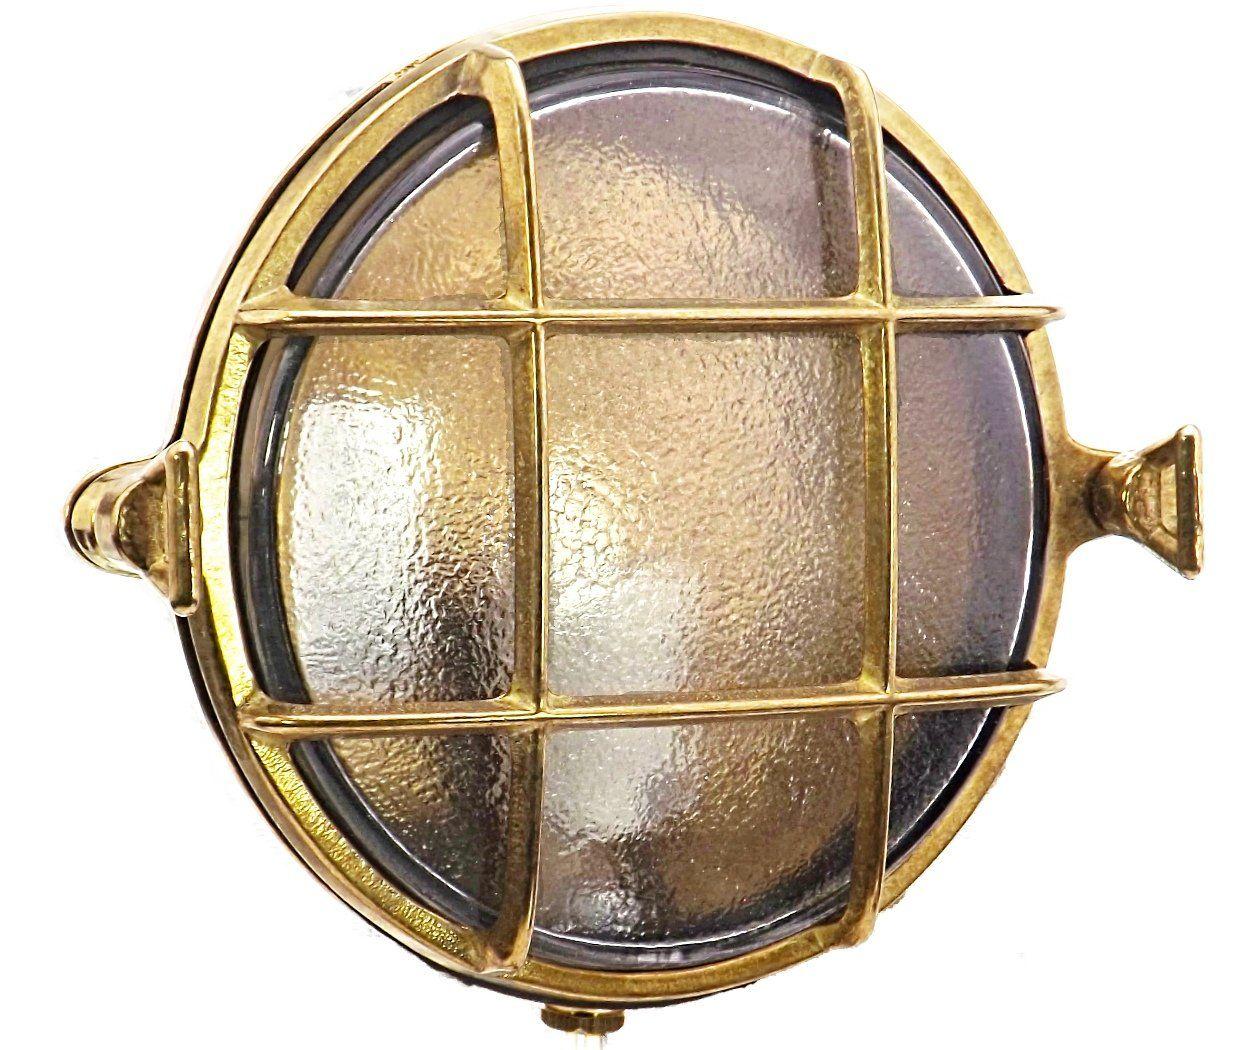 3a13b399146 Rotterdam compact Brass bulkhead Round outdoor waterproof light Nautical  marine wall lamp